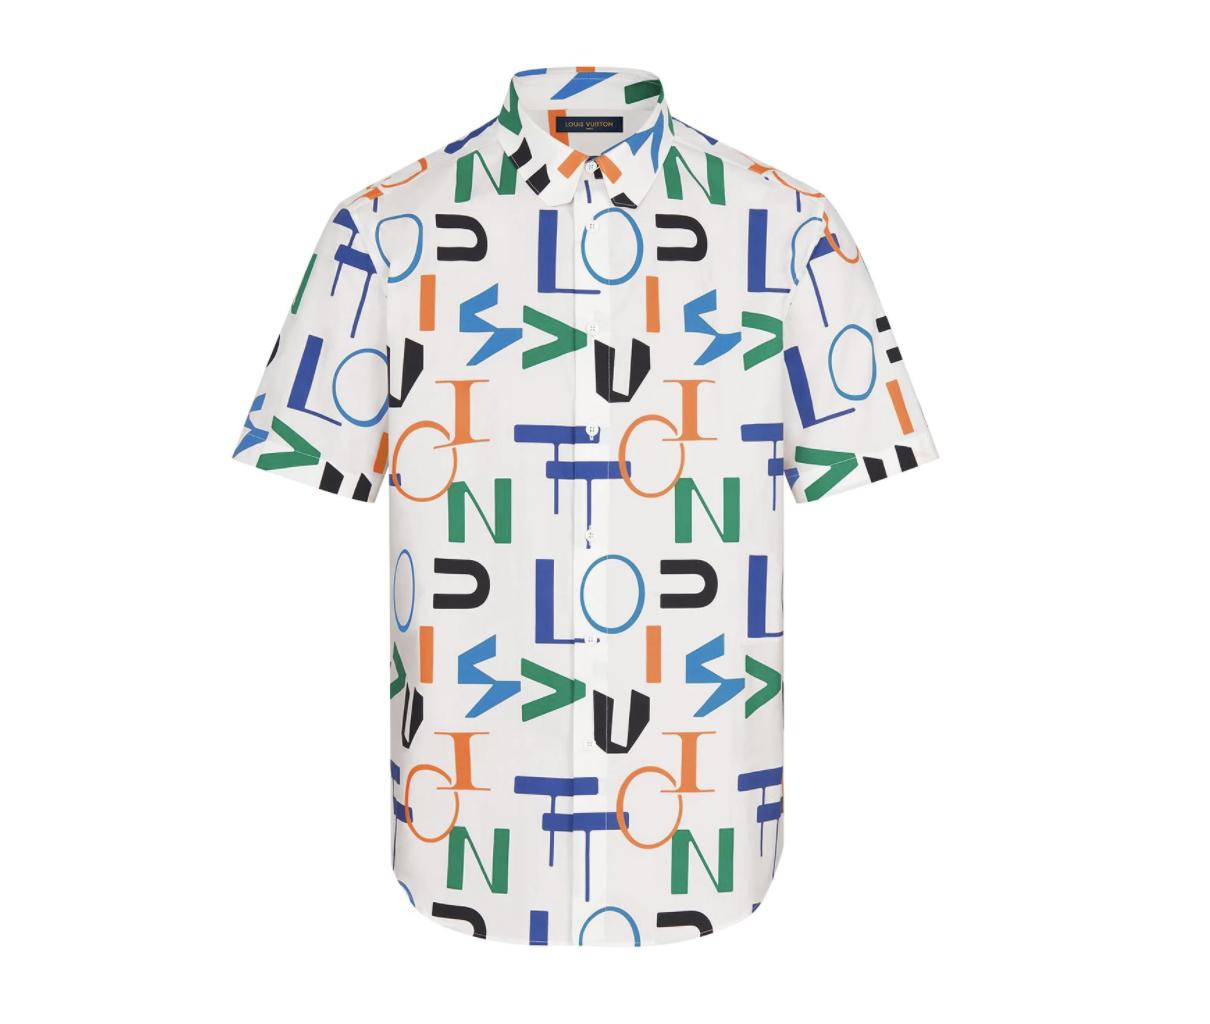 Louis Vuitton Electric Short Sleeve Shirt